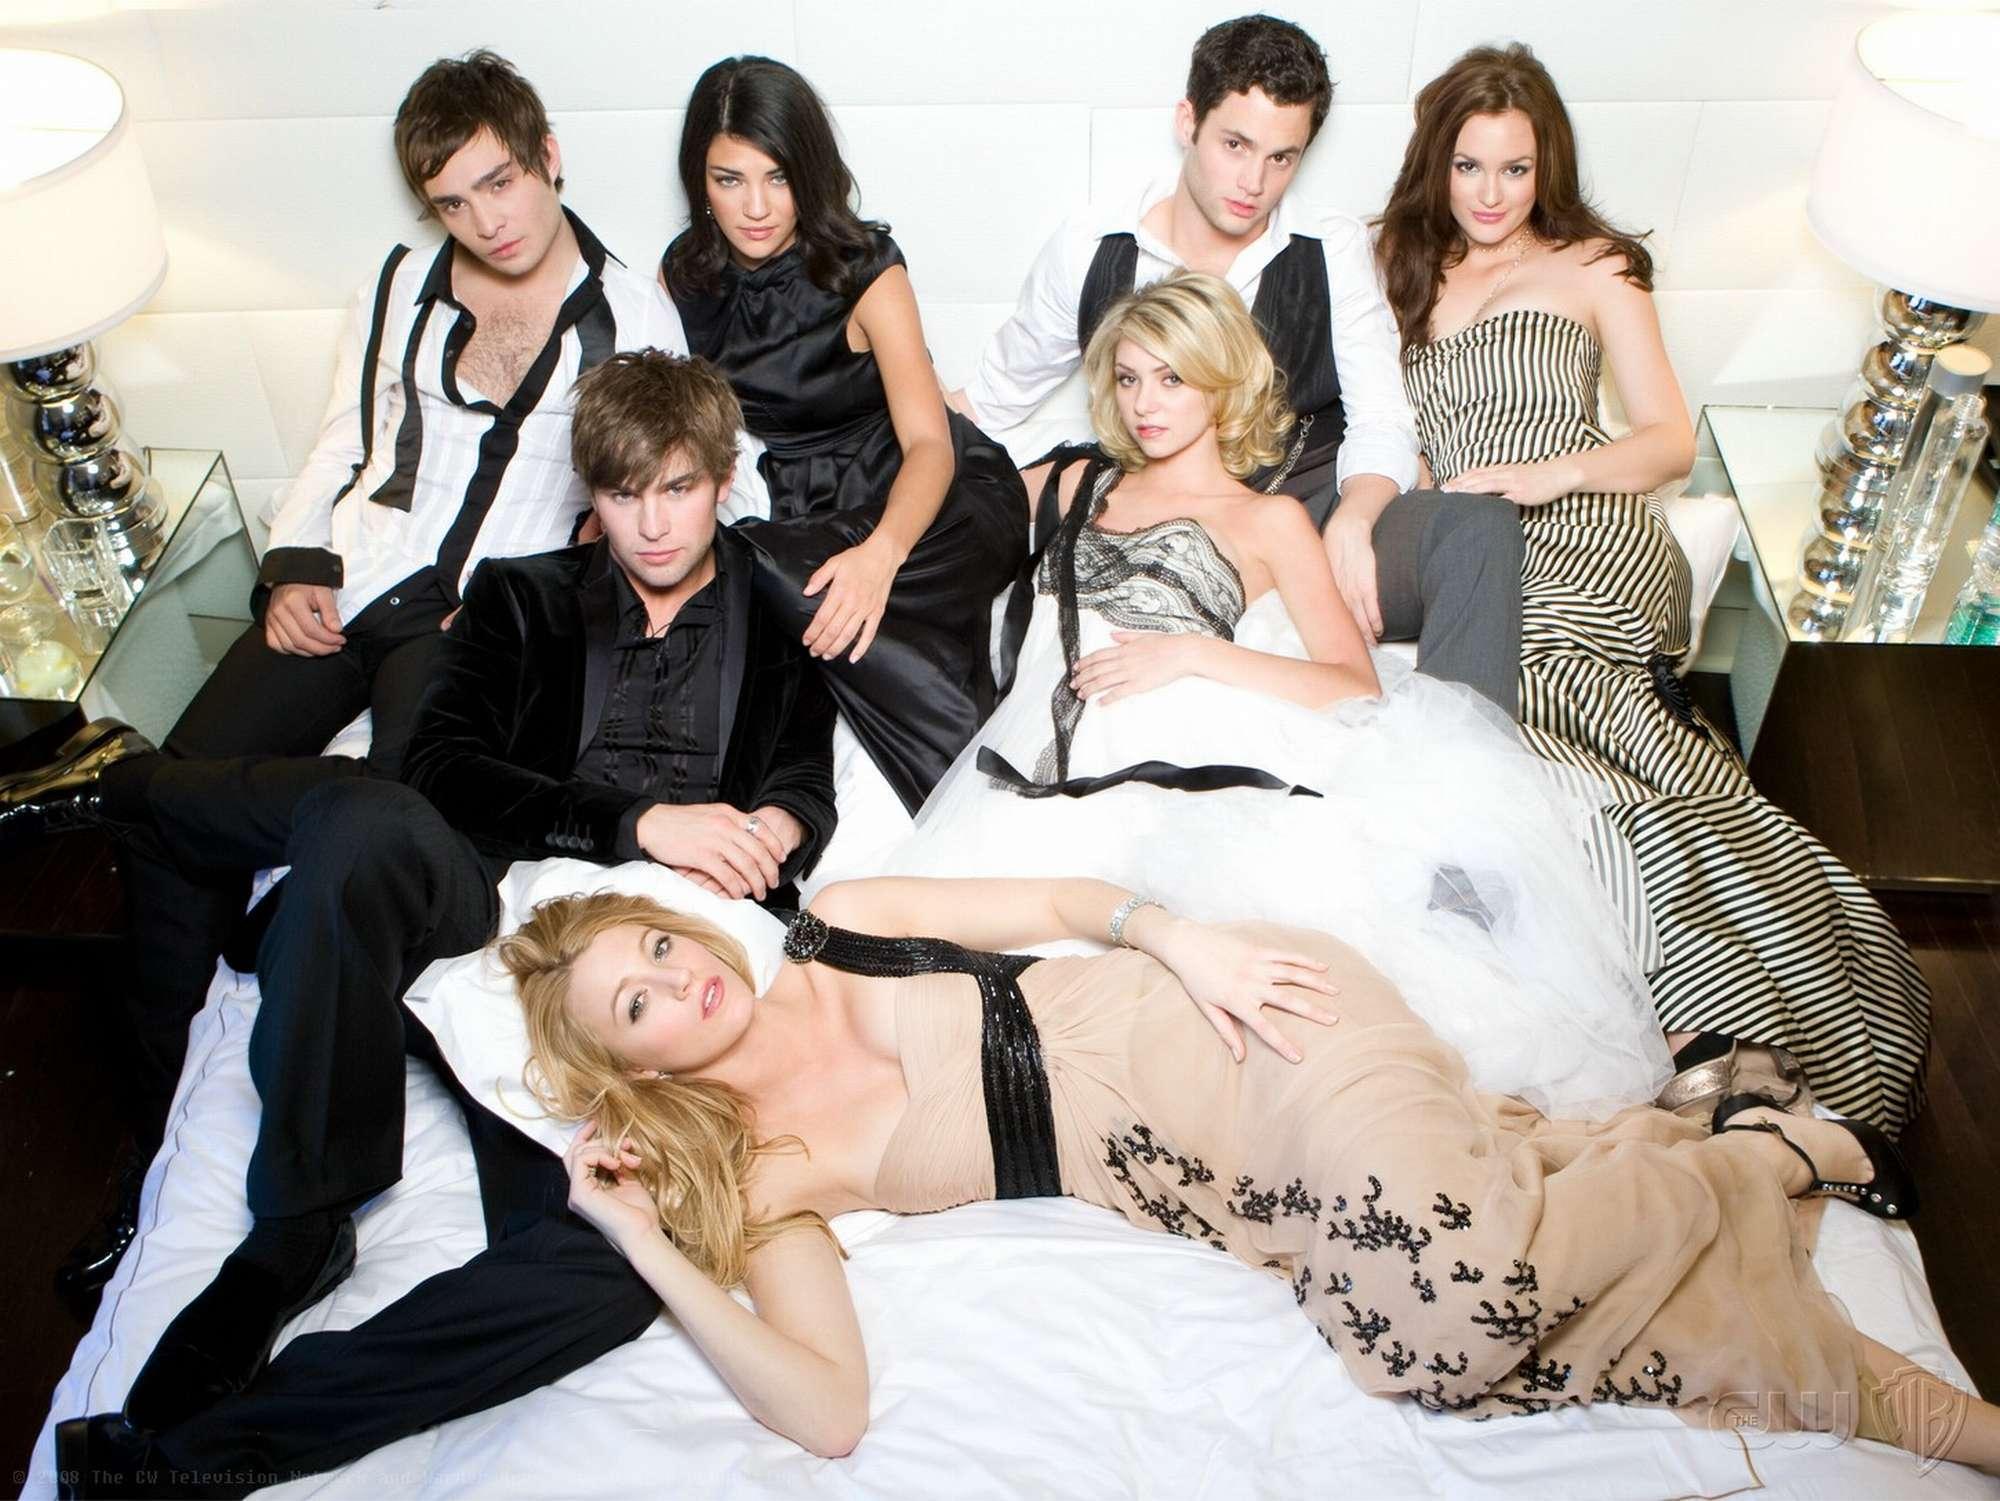 gossip girl cast season 2 episode 1